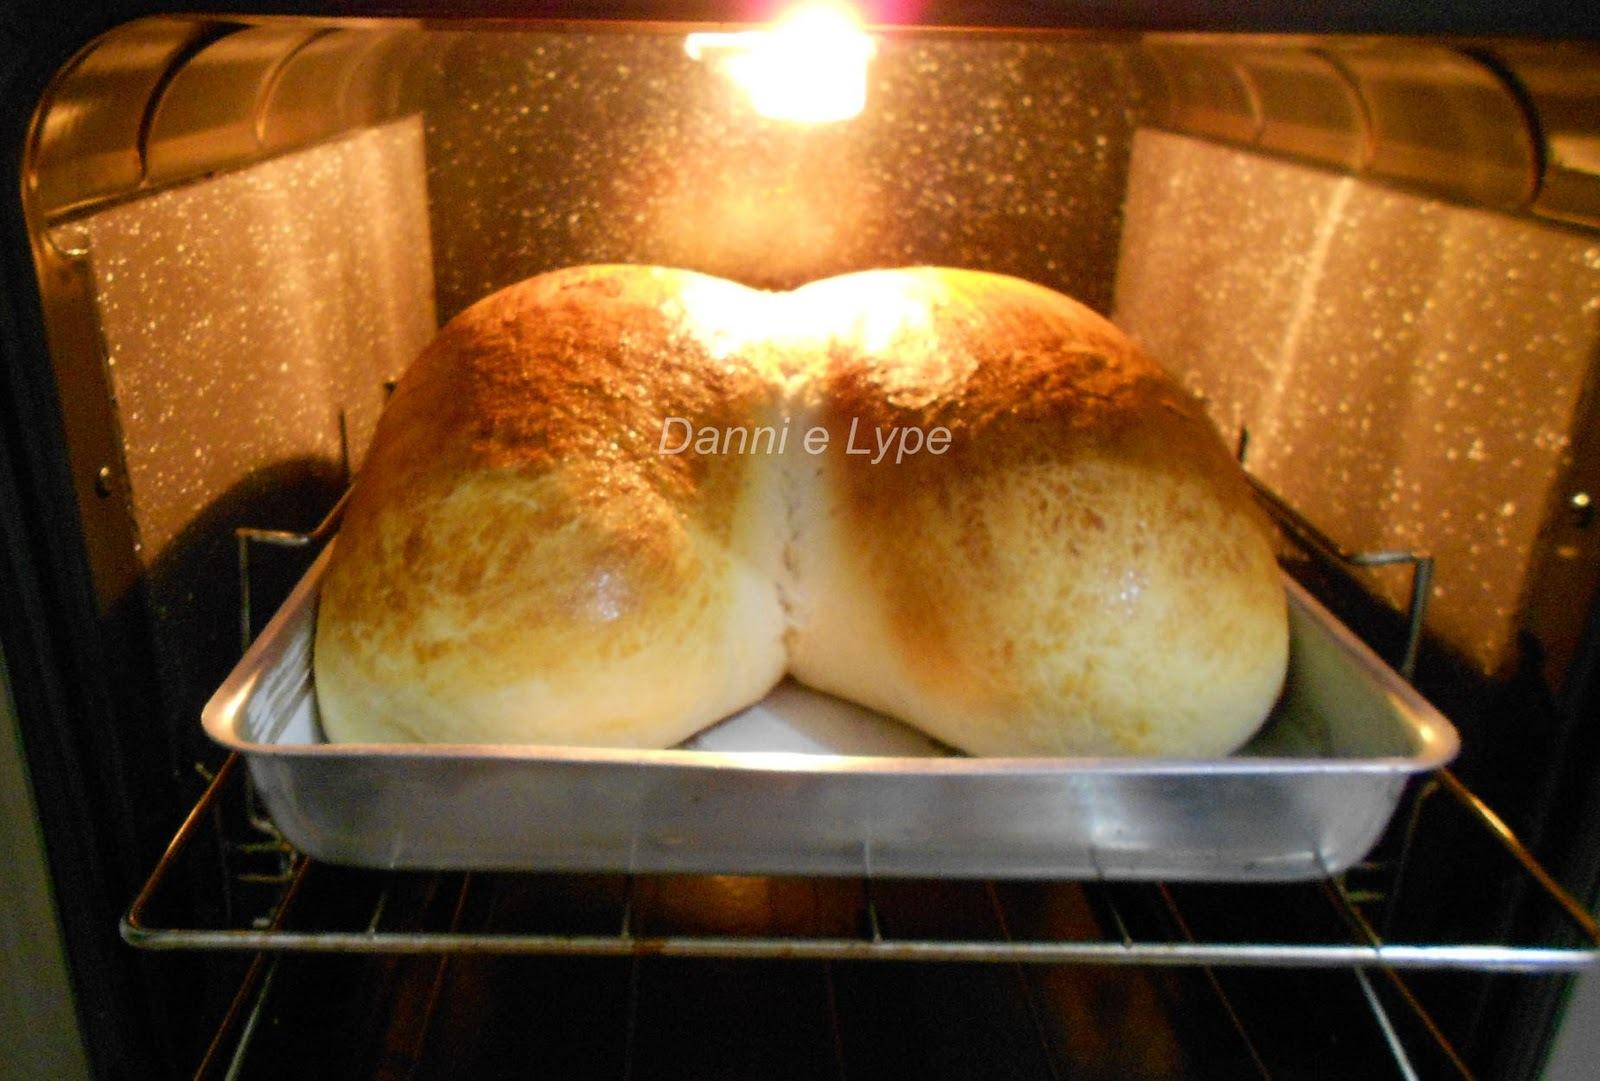 fermento caseiro de batata para pao